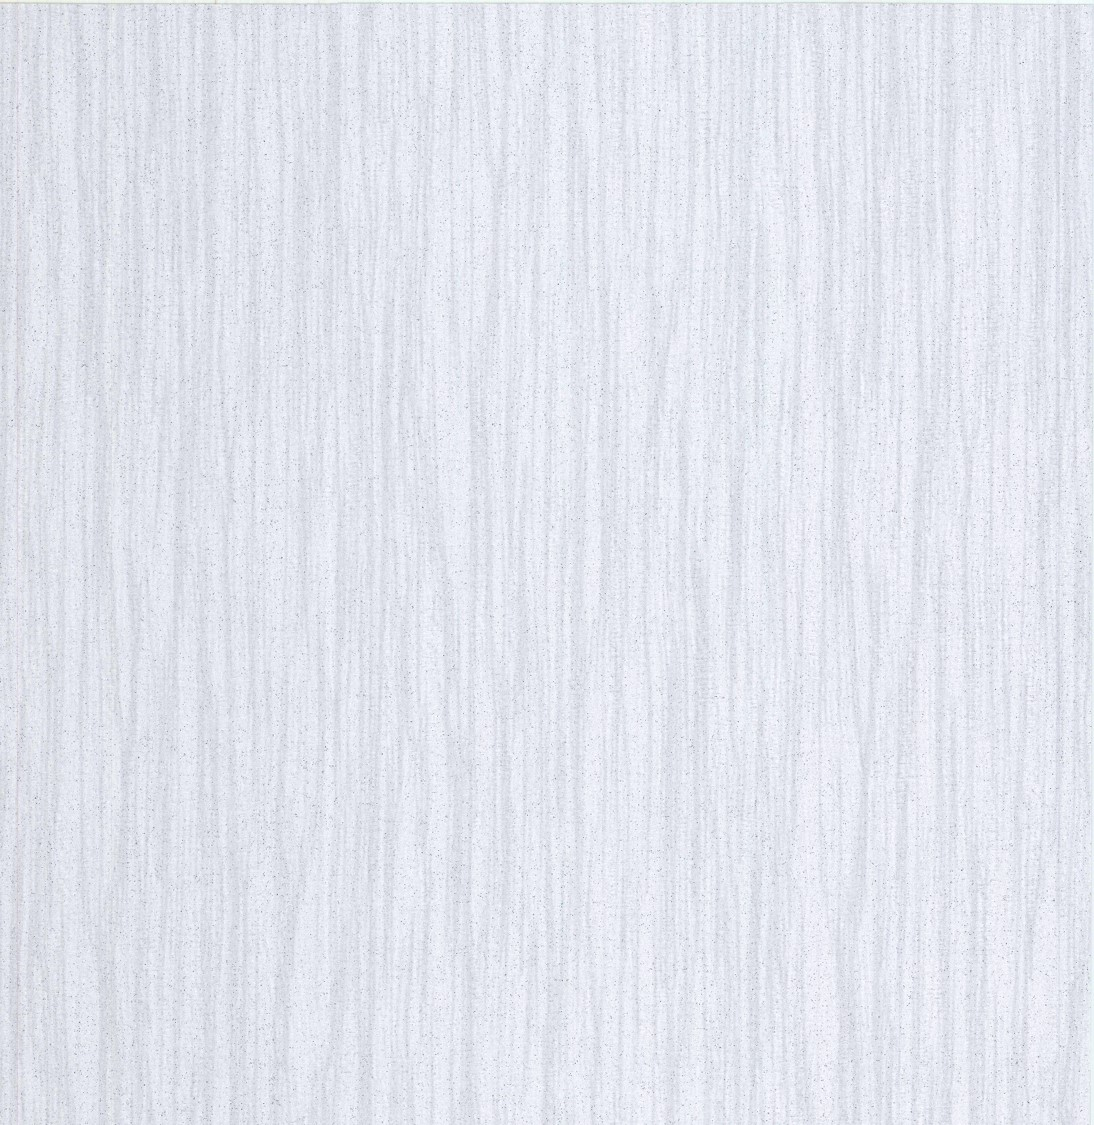 fine decor milano 6 textured vinyl wallpaper m95574. Black Bedroom Furniture Sets. Home Design Ideas